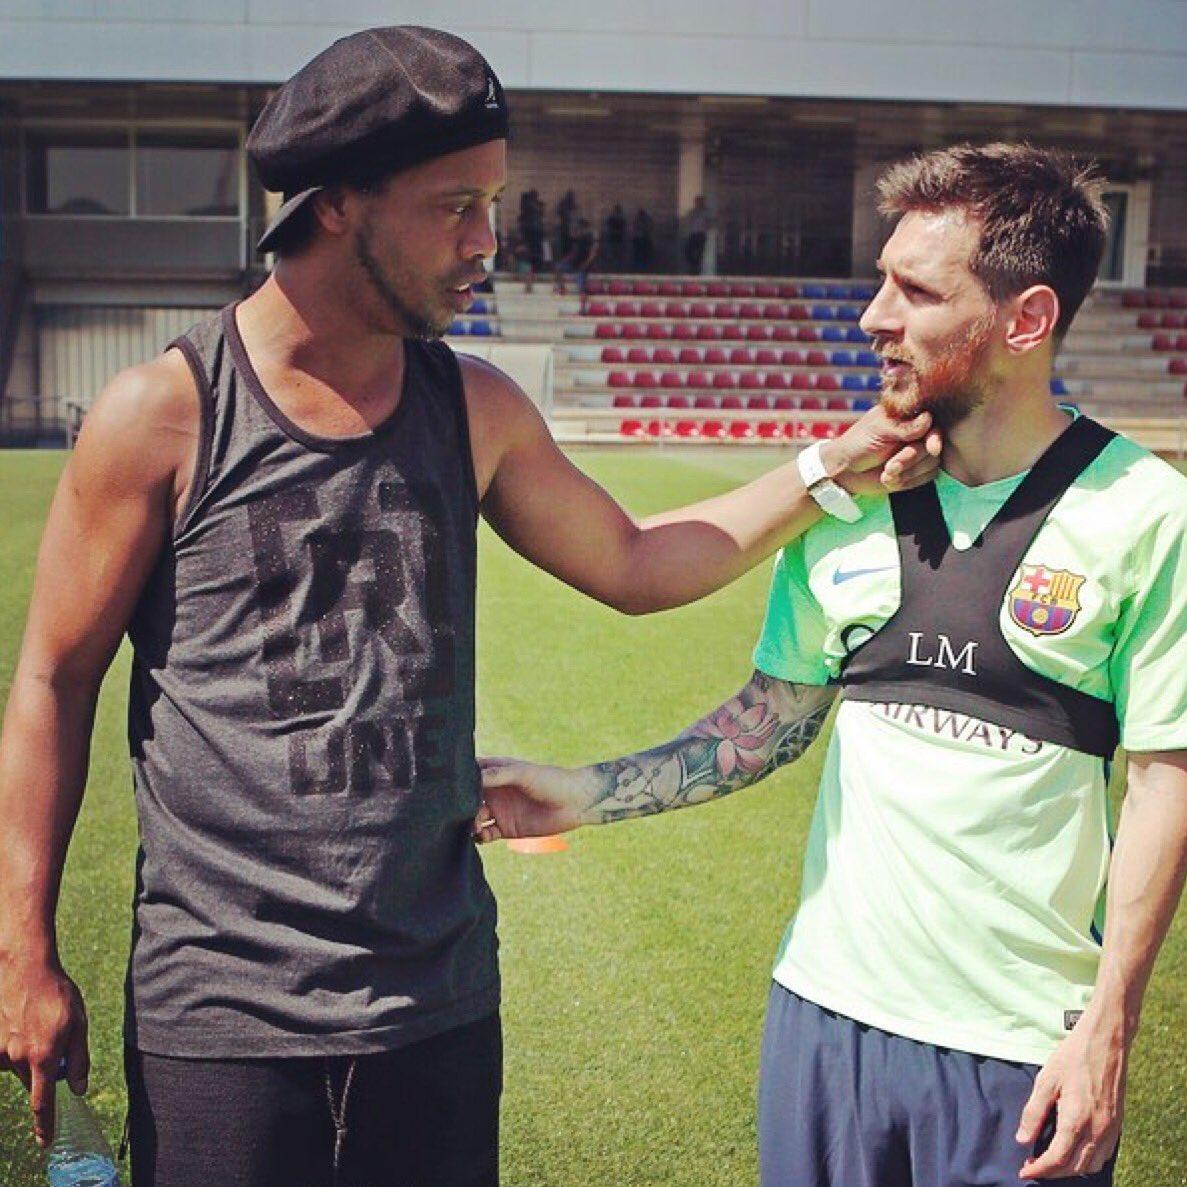 Ronaldinho &amp; Messi today  #Messi #WeAreMessi<br>http://pic.twitter.com/LG8FkUzInp